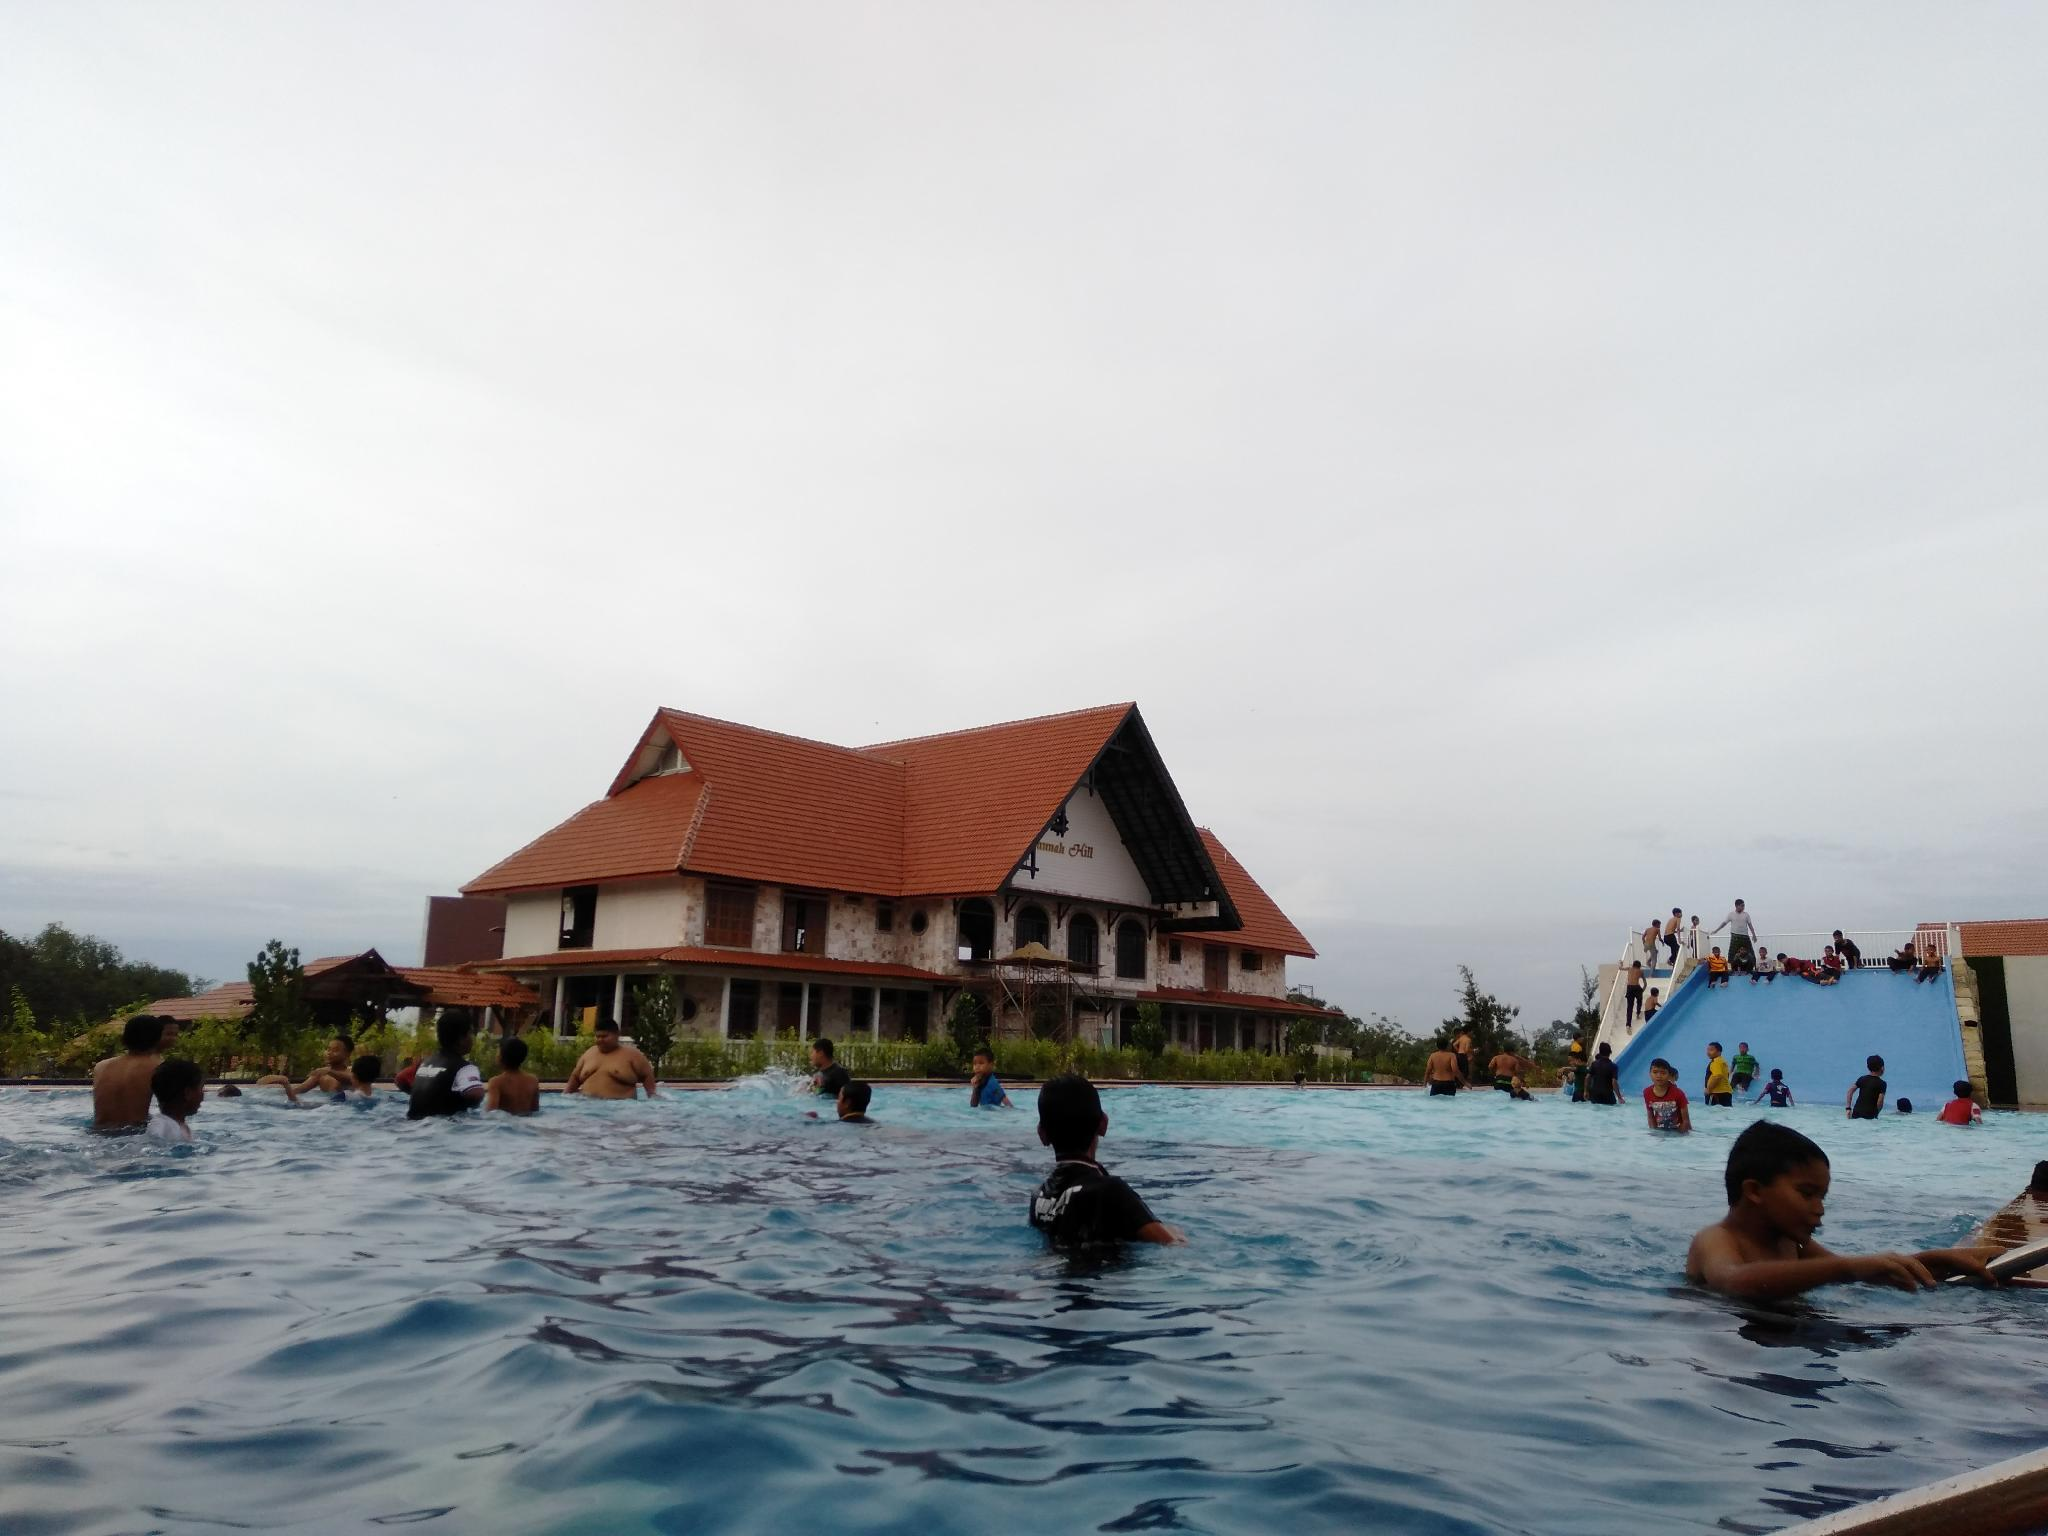 Savanna Hill Resort, Kota Tinggi